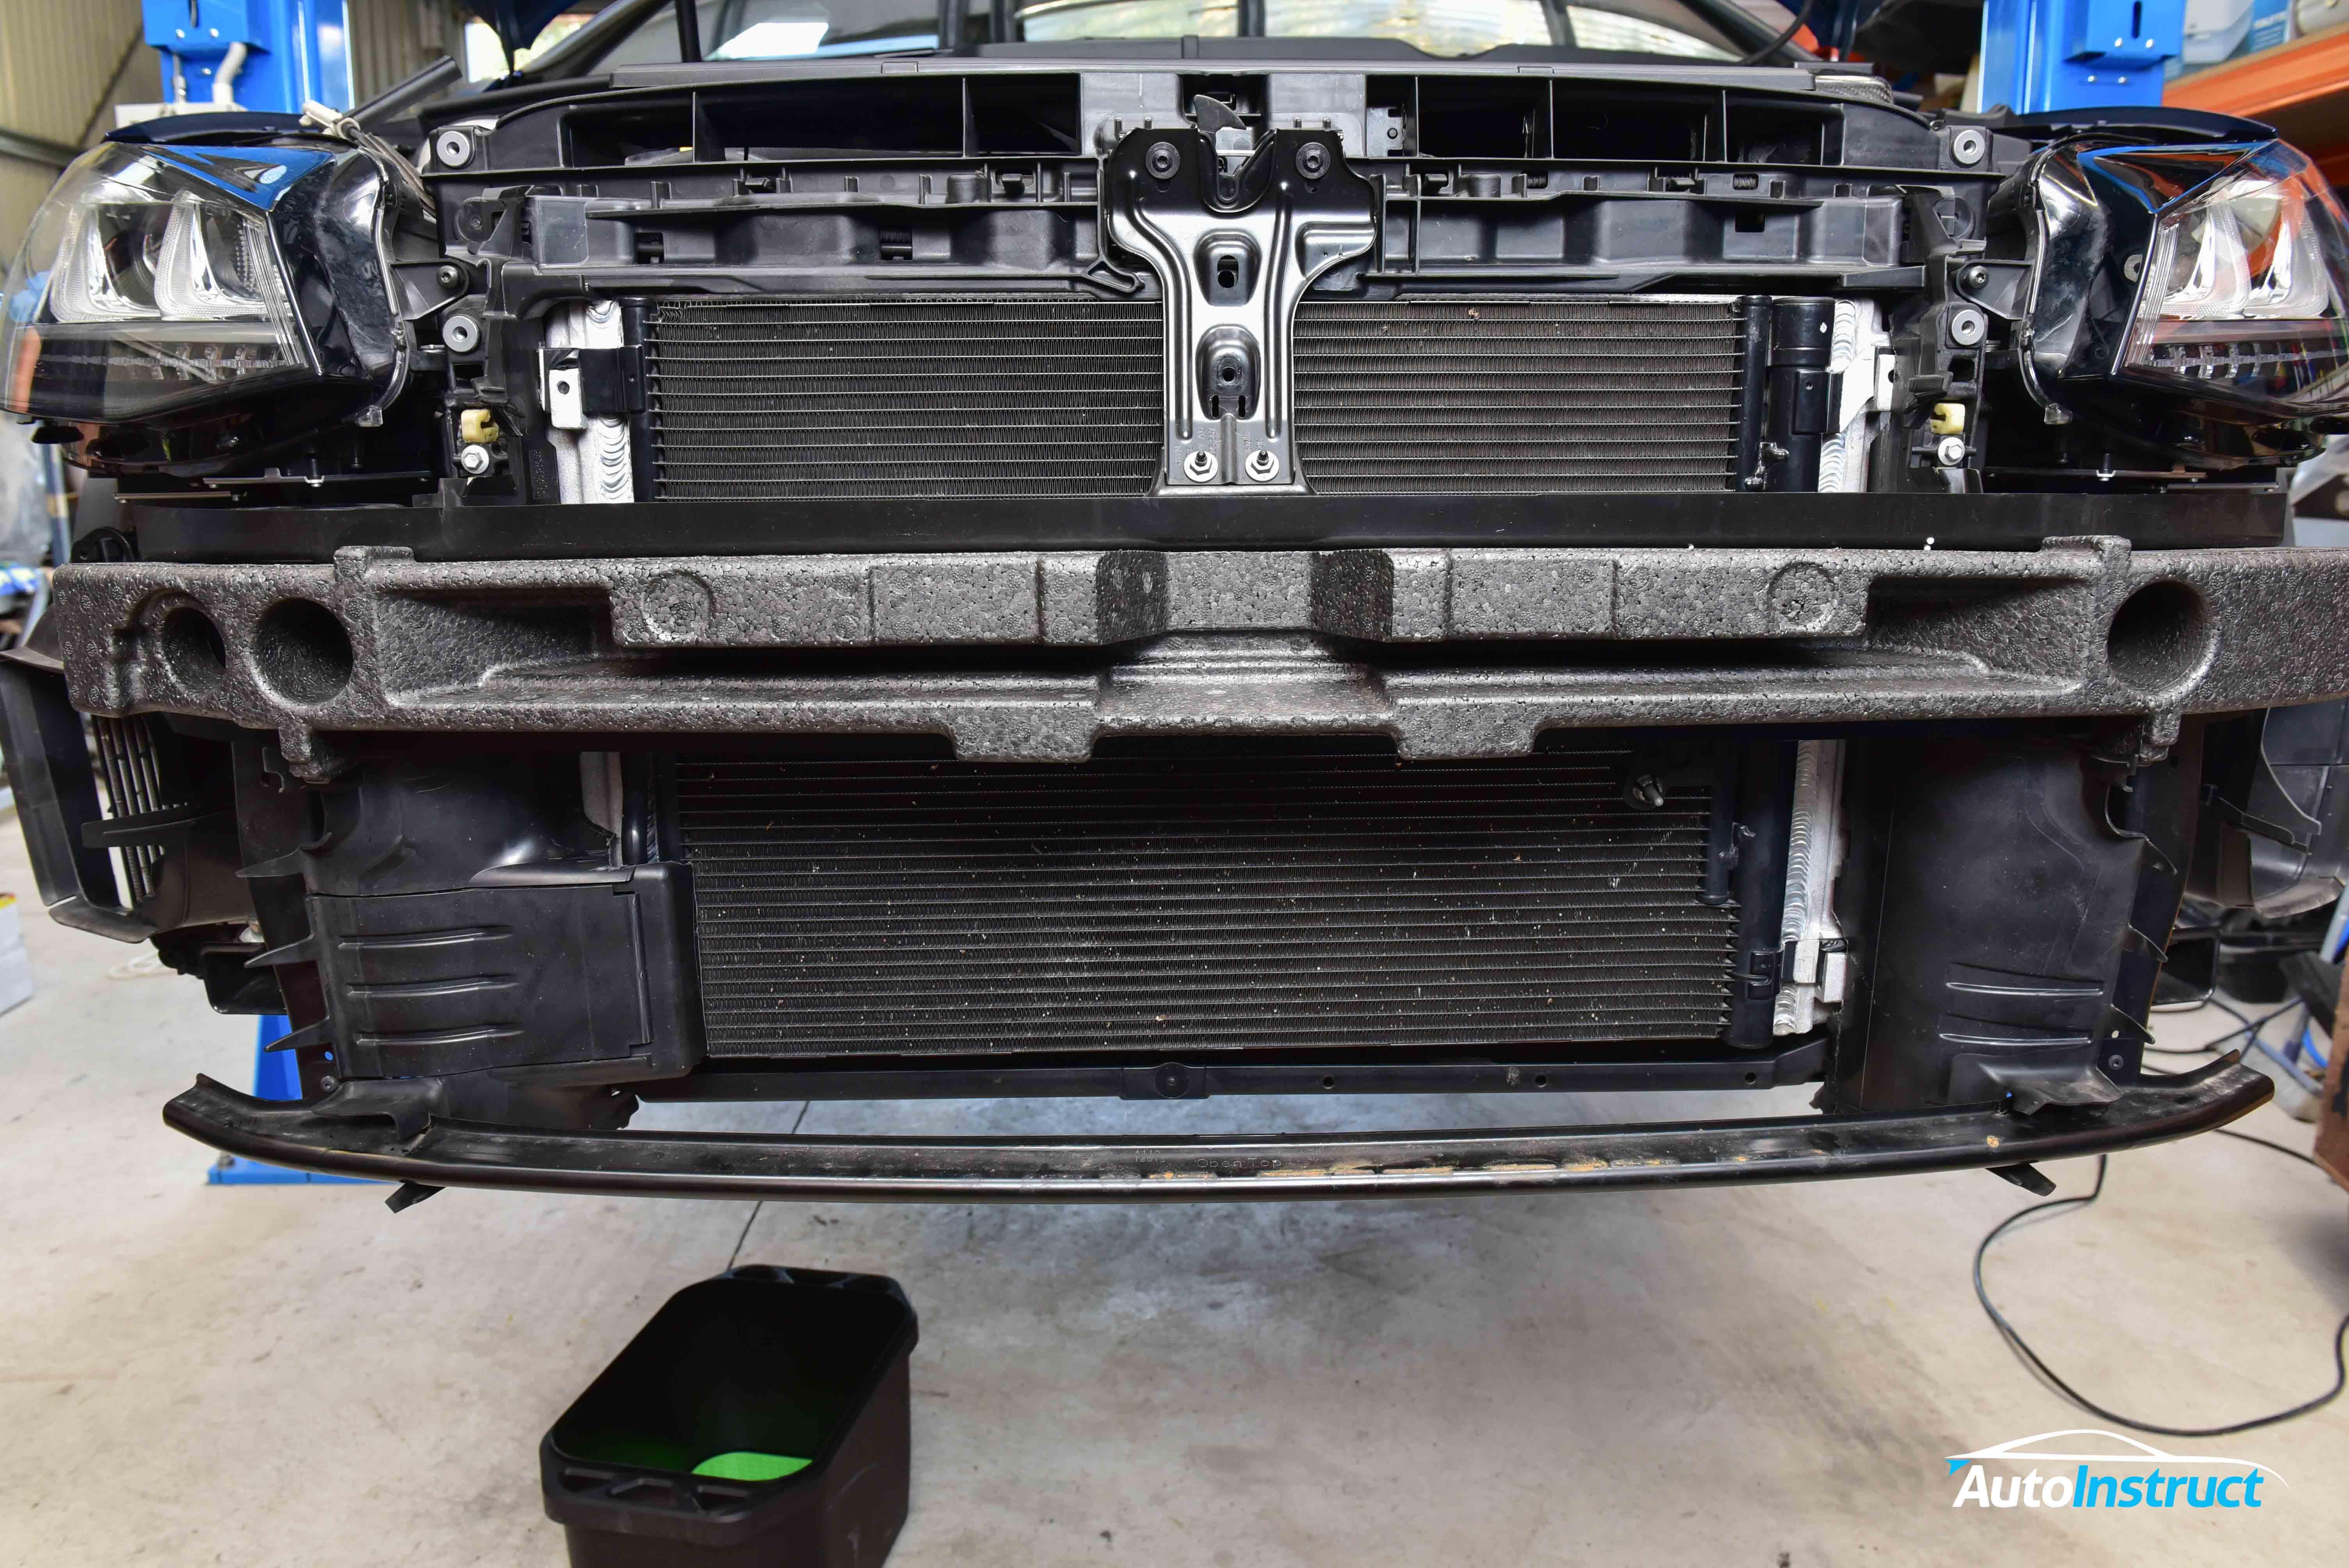 Intercooler Install Tutorial Mk7 Golf Autoinstruct